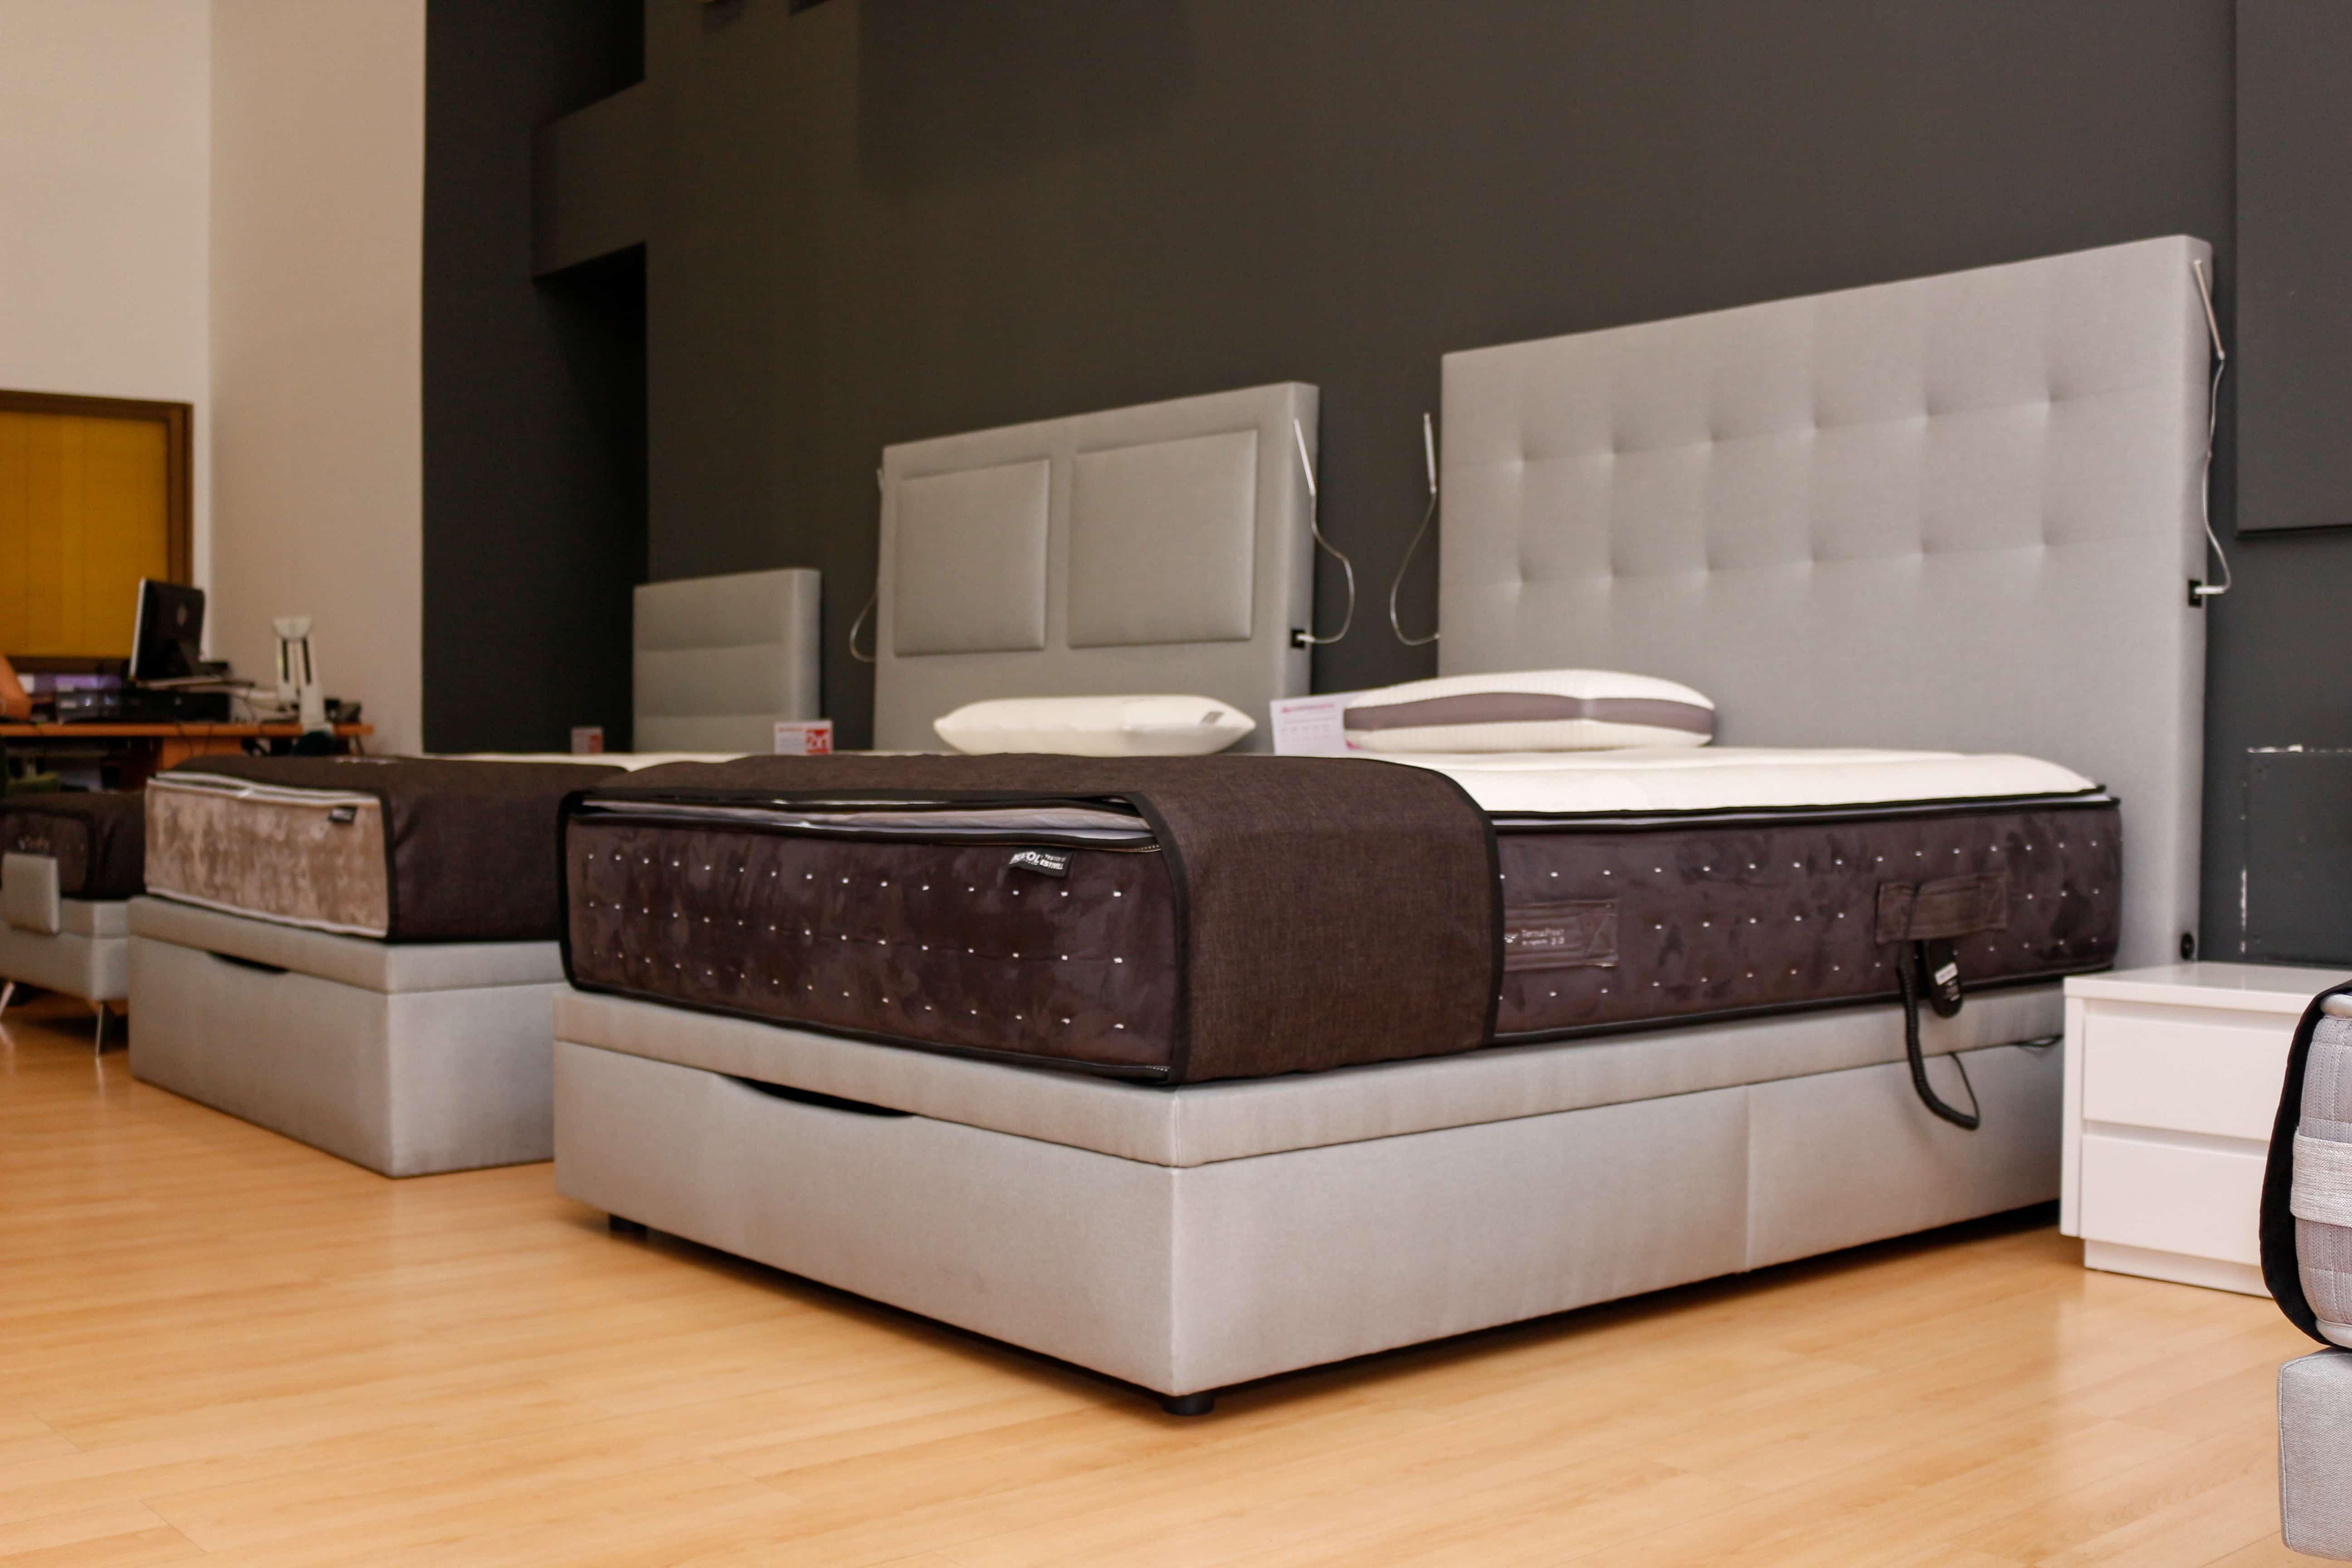 Dormitorios modernos baratos y bonitos colch n expr s - Dormitorios modernos baratos ...